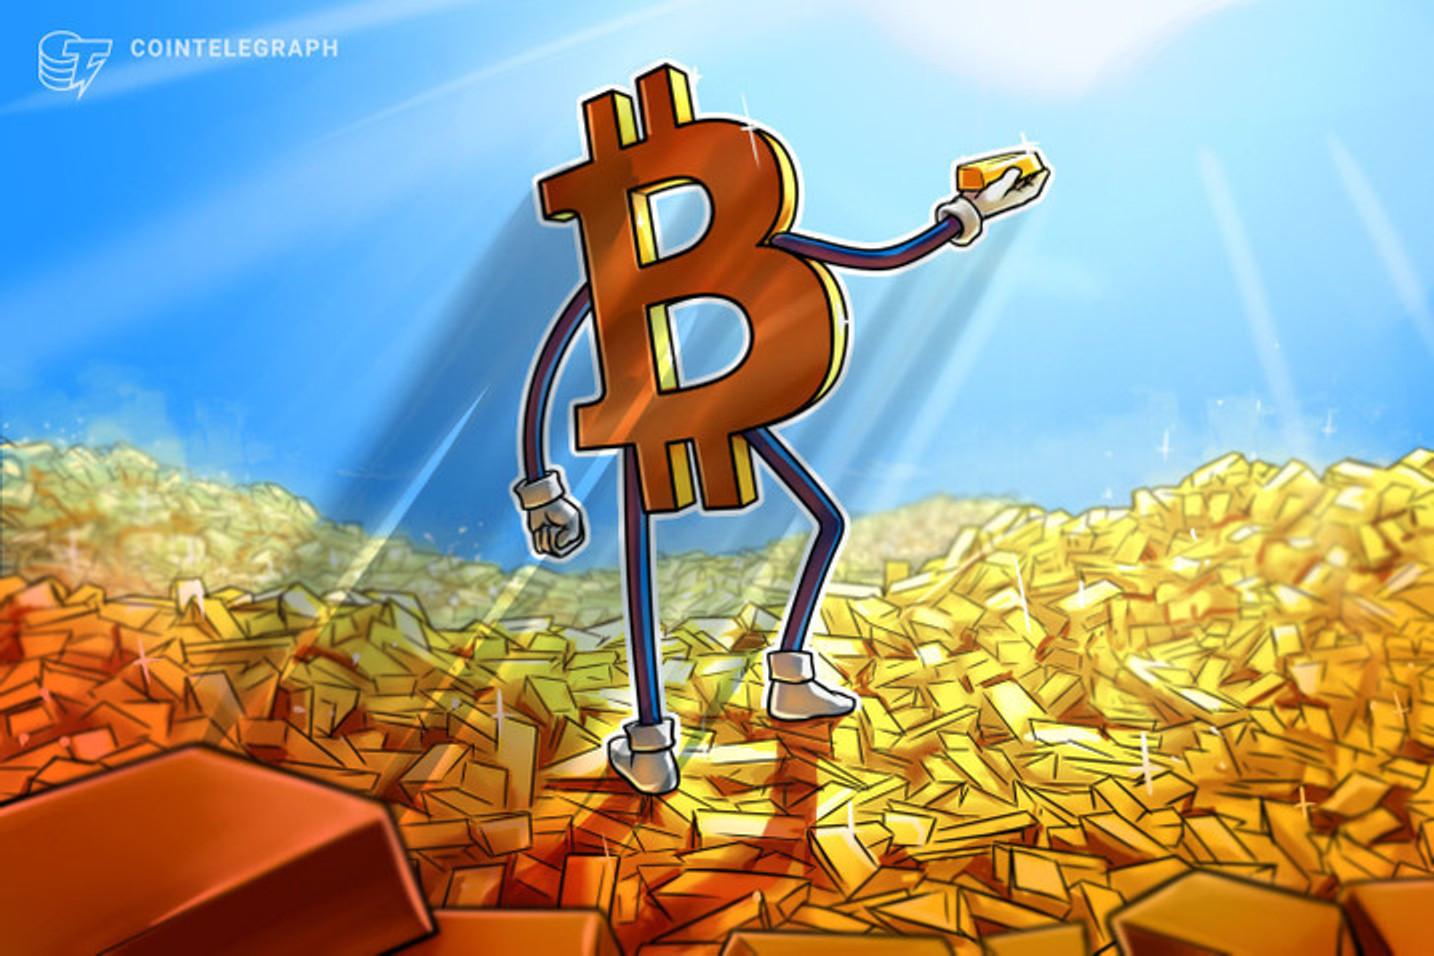 ¿qué pasa si invierto 5000 en bitcoin?